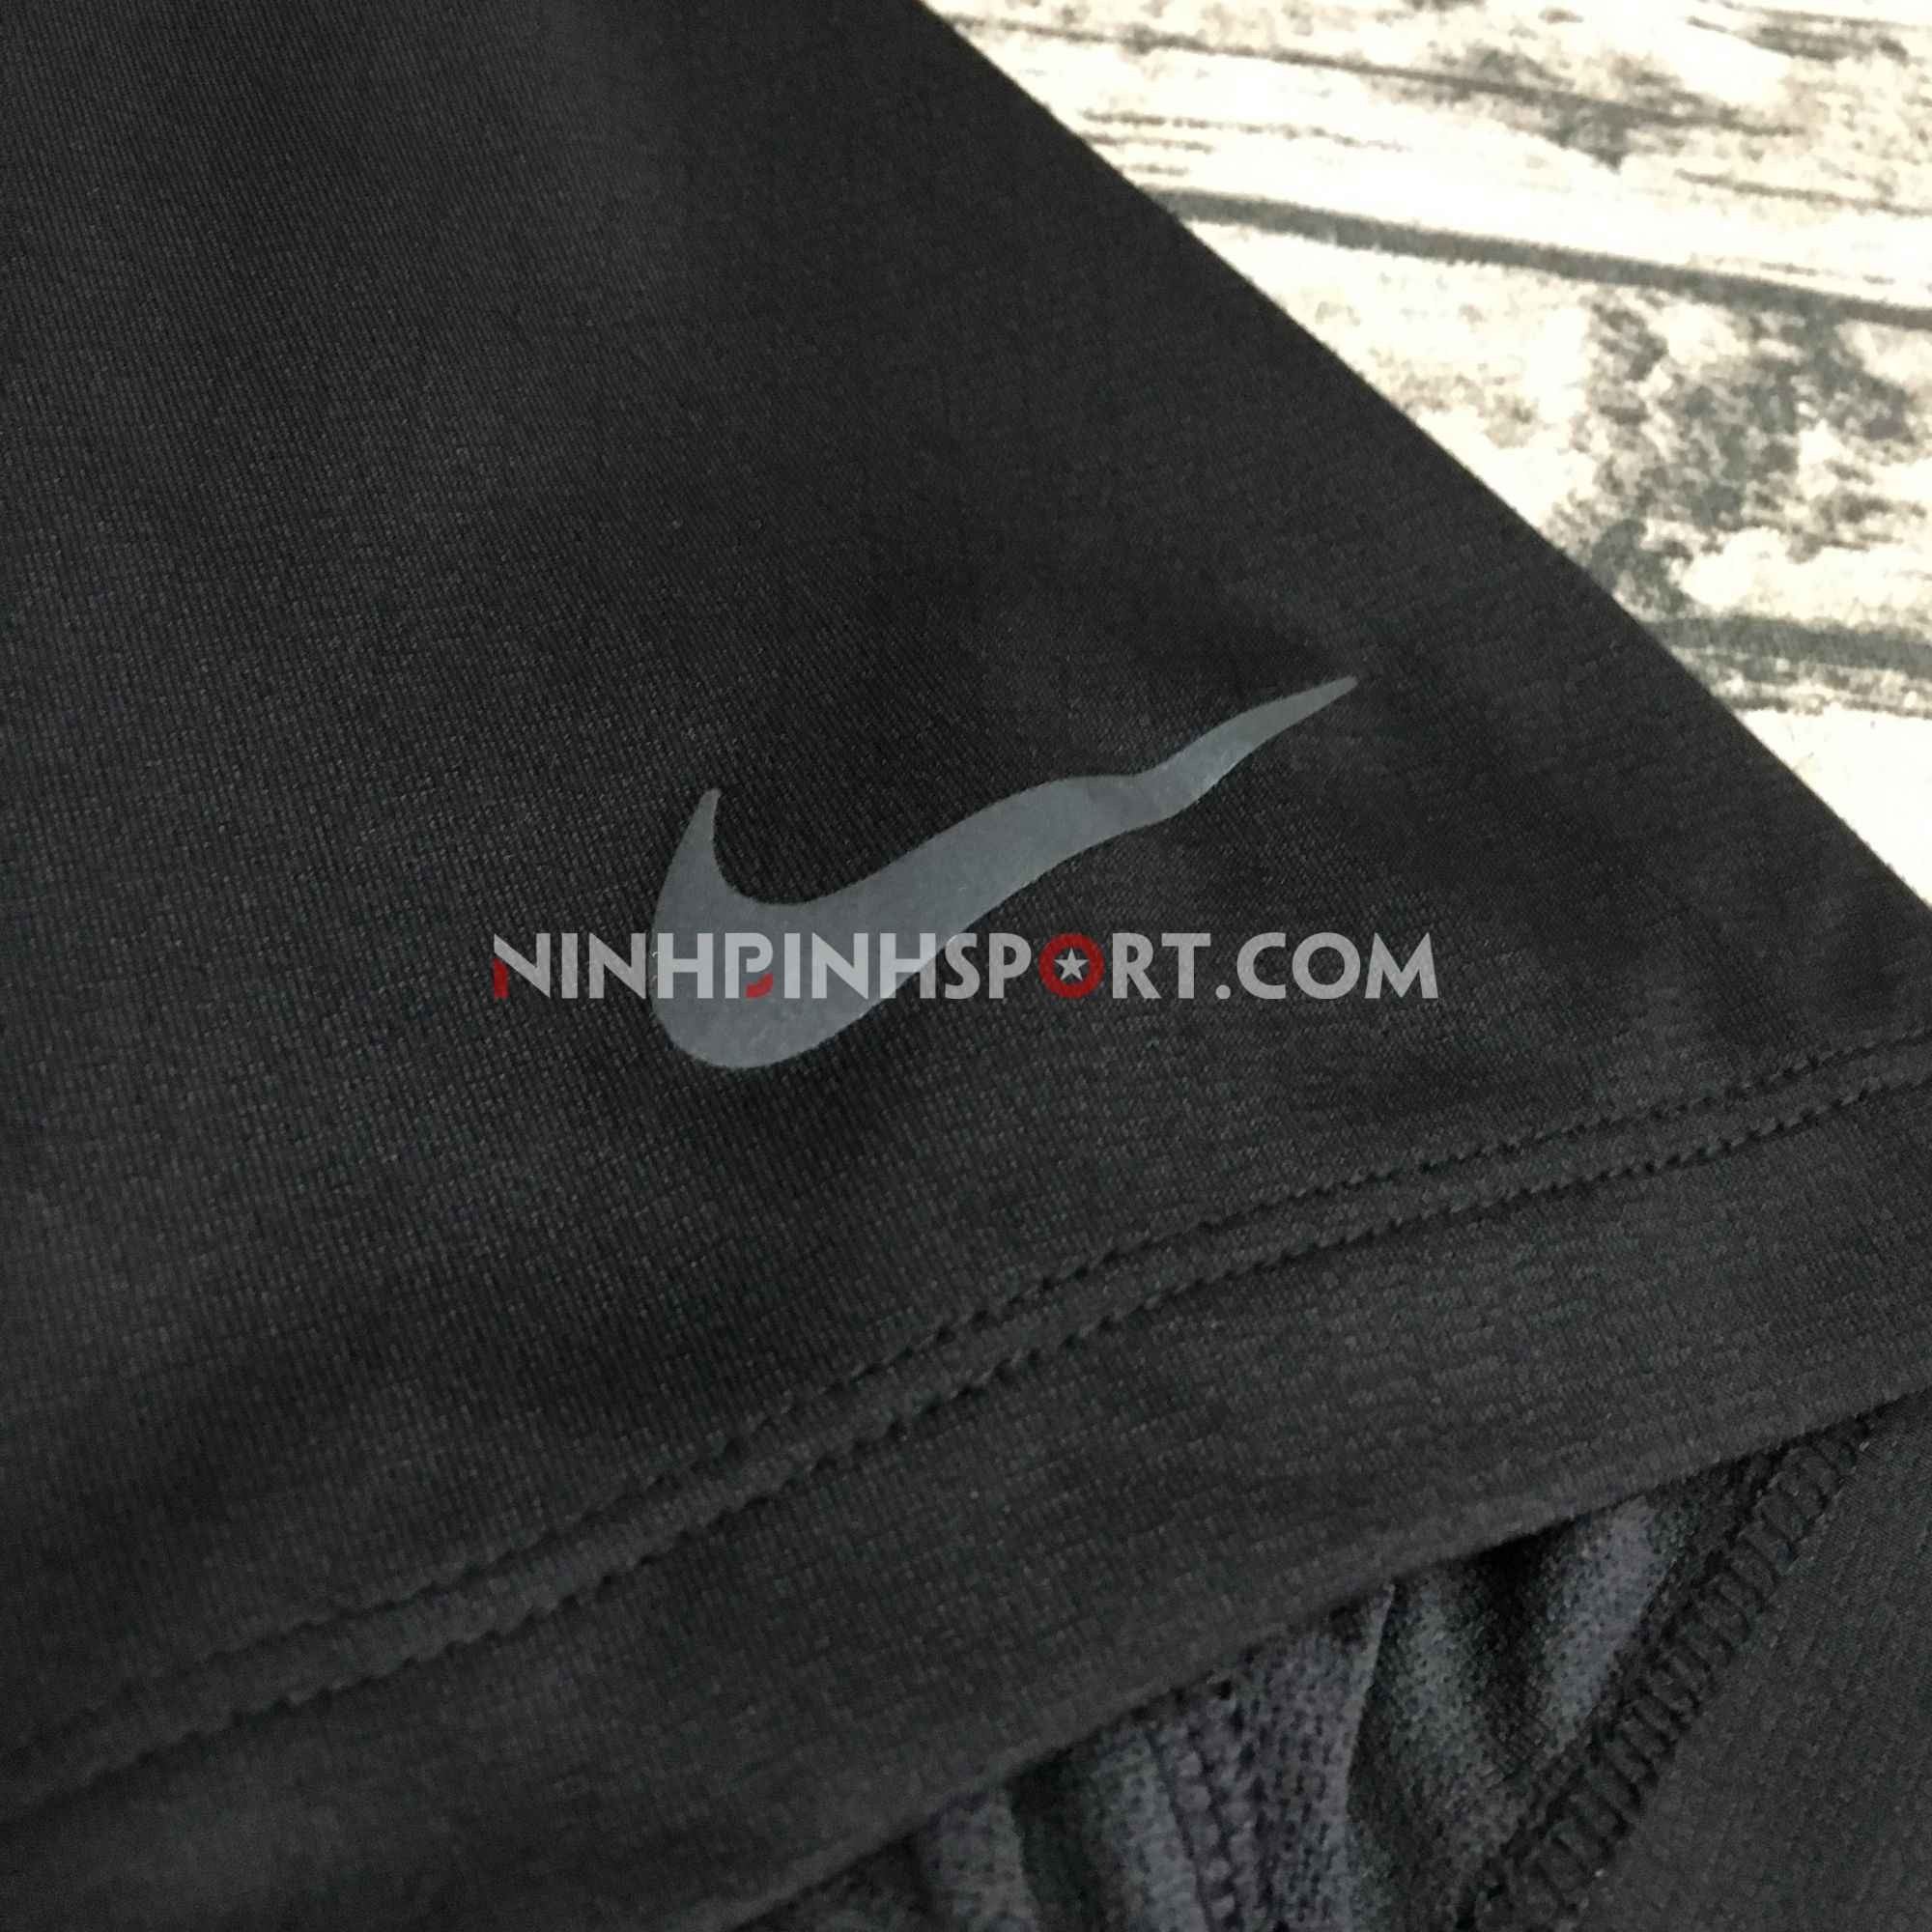 Áo thể thao nam Nike Dri-fit Miler Tech Black CD5731-010